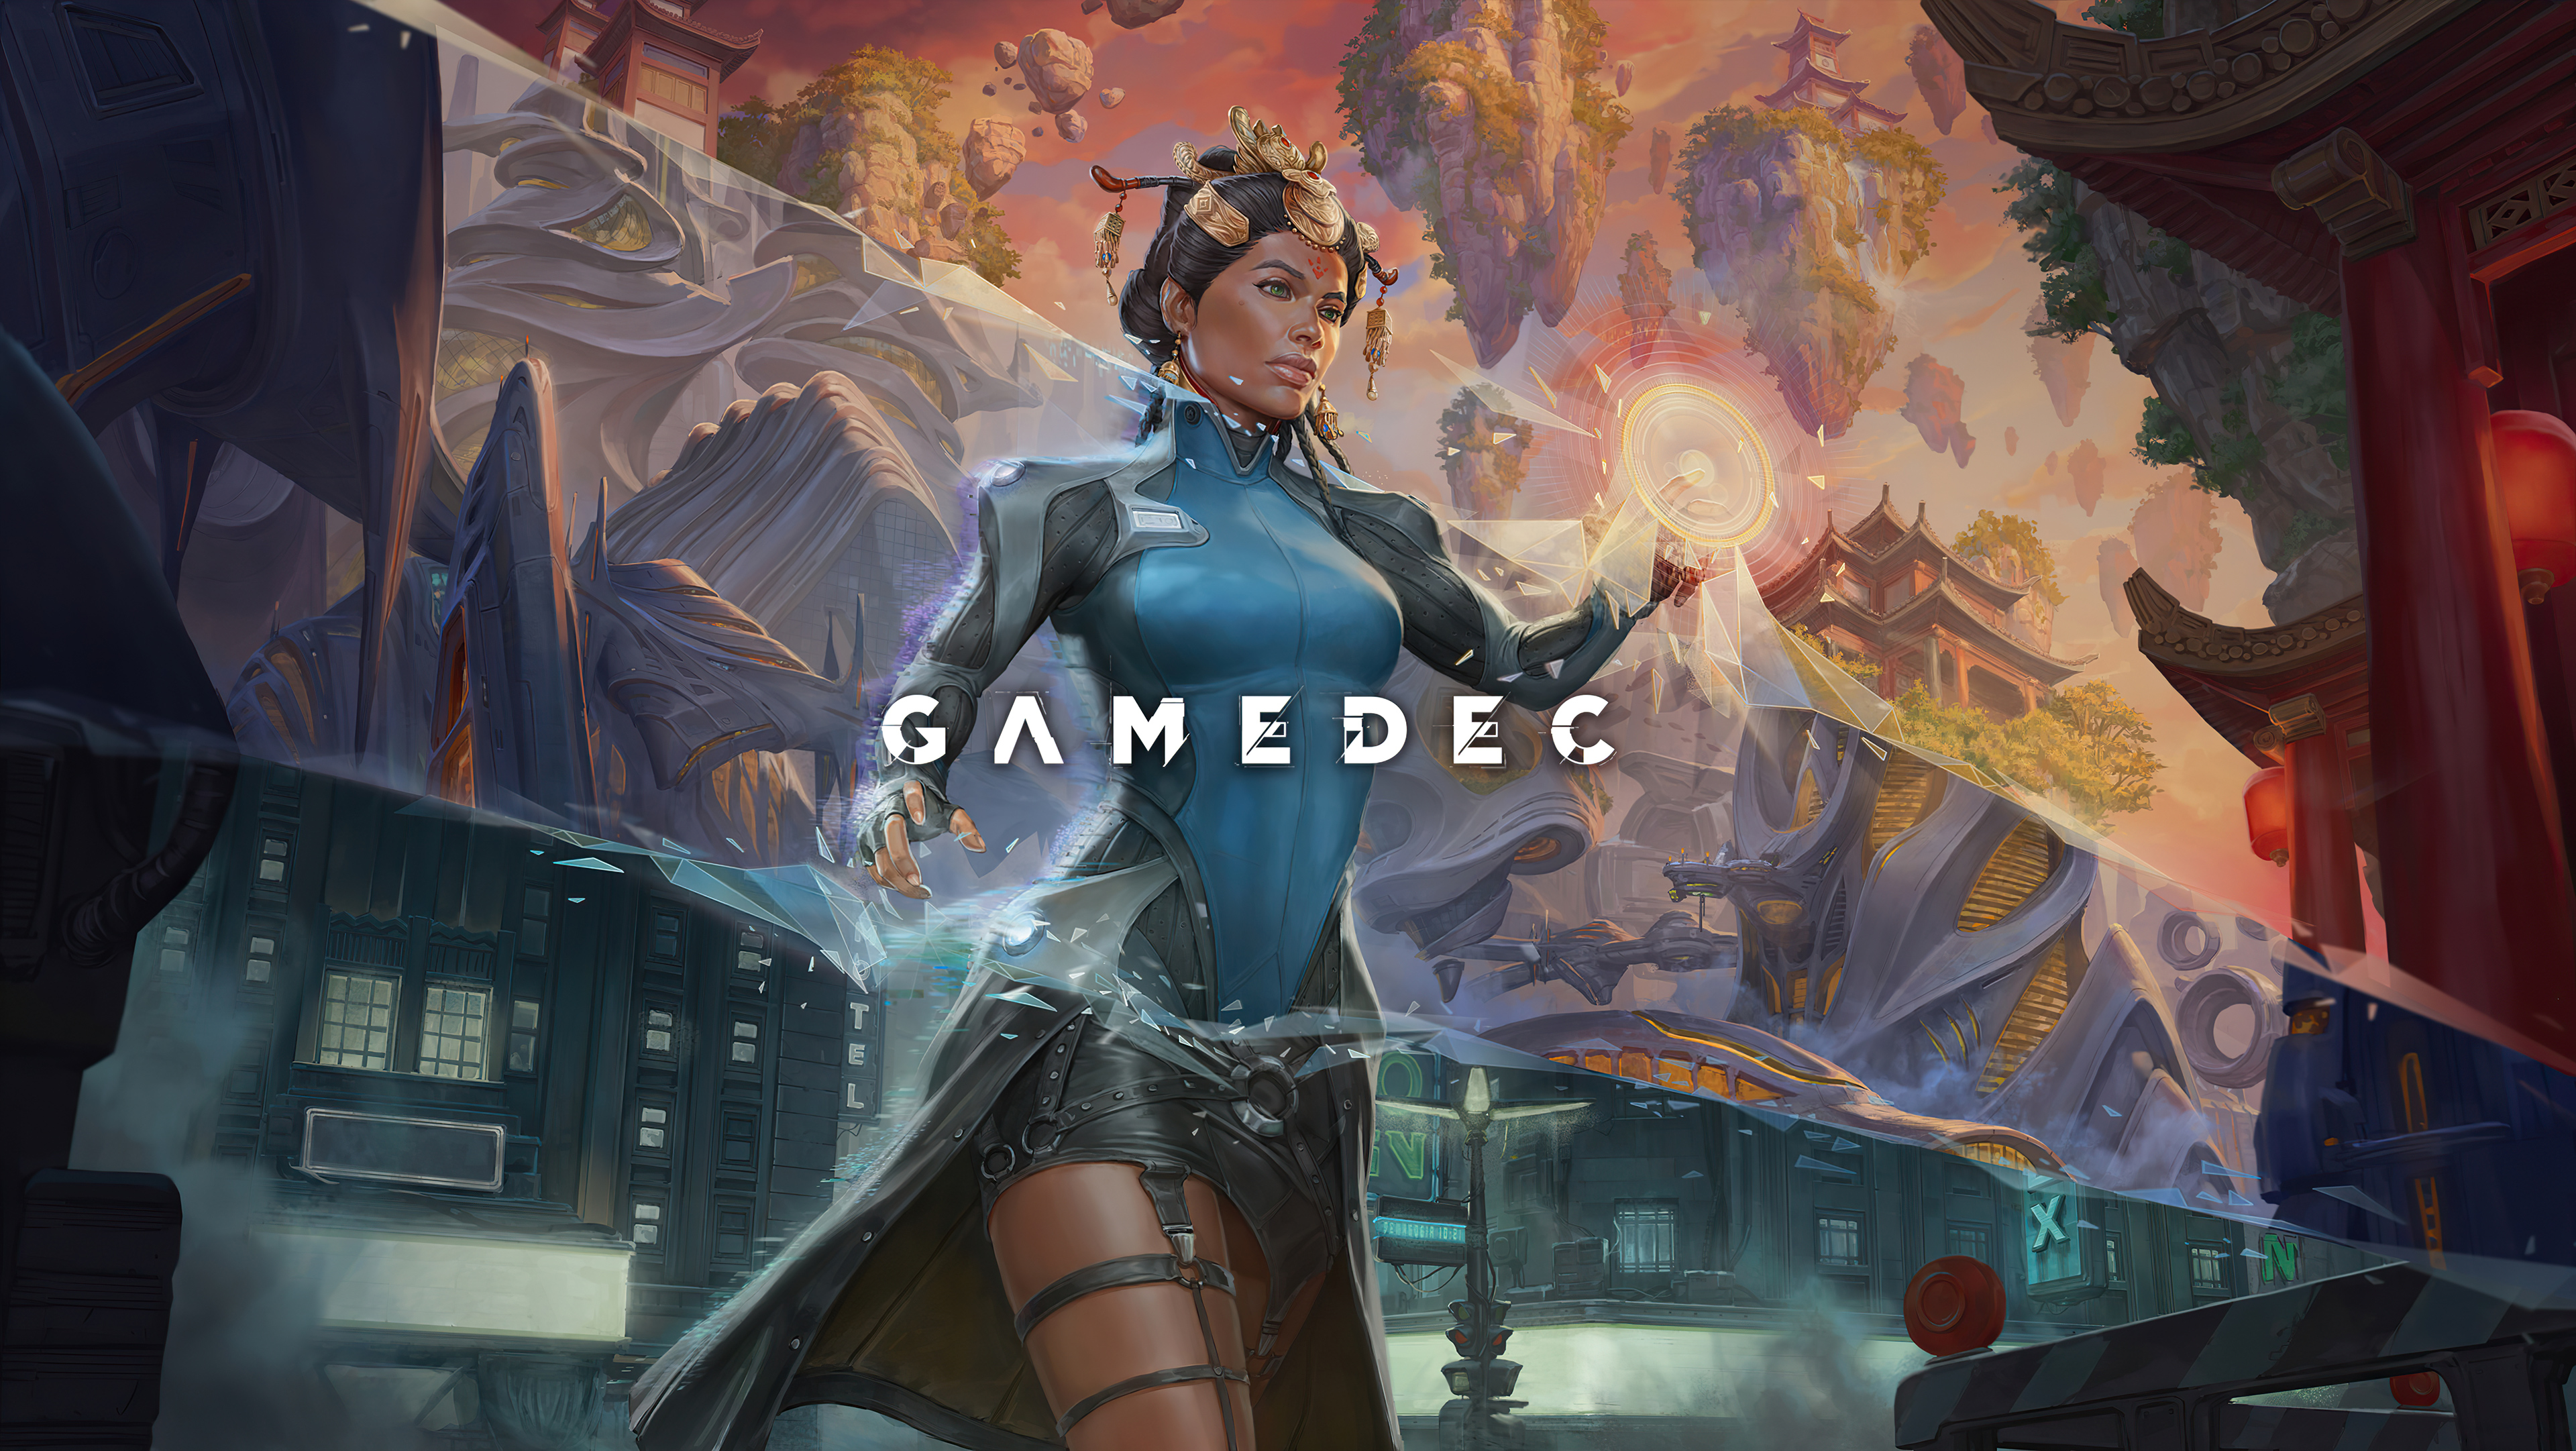 gamedec 1589582285 - Gamedec - Gamedec wallpapers, Gamedec game wallpapers 4k, Gamedec 4k wallpapers